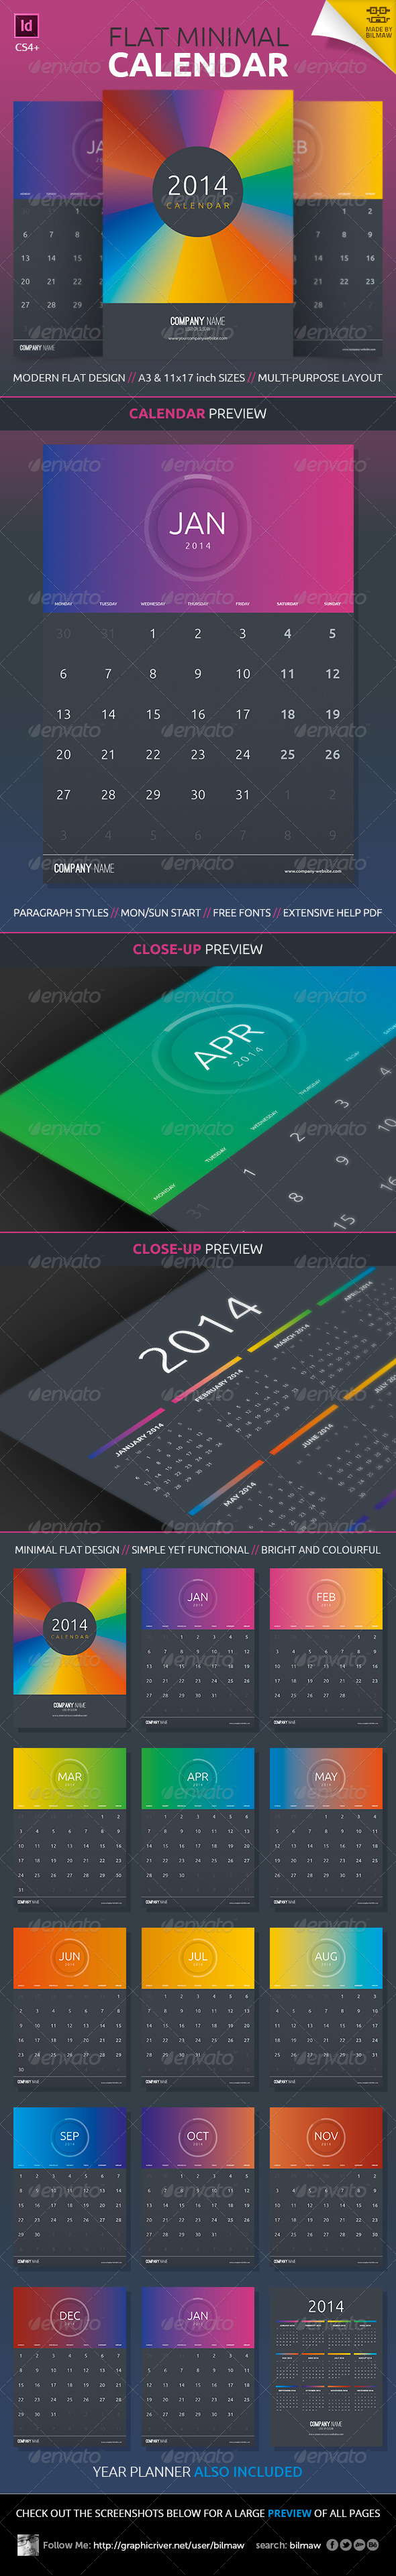 GraphicRiver Flat Minimal Calendar 5906976